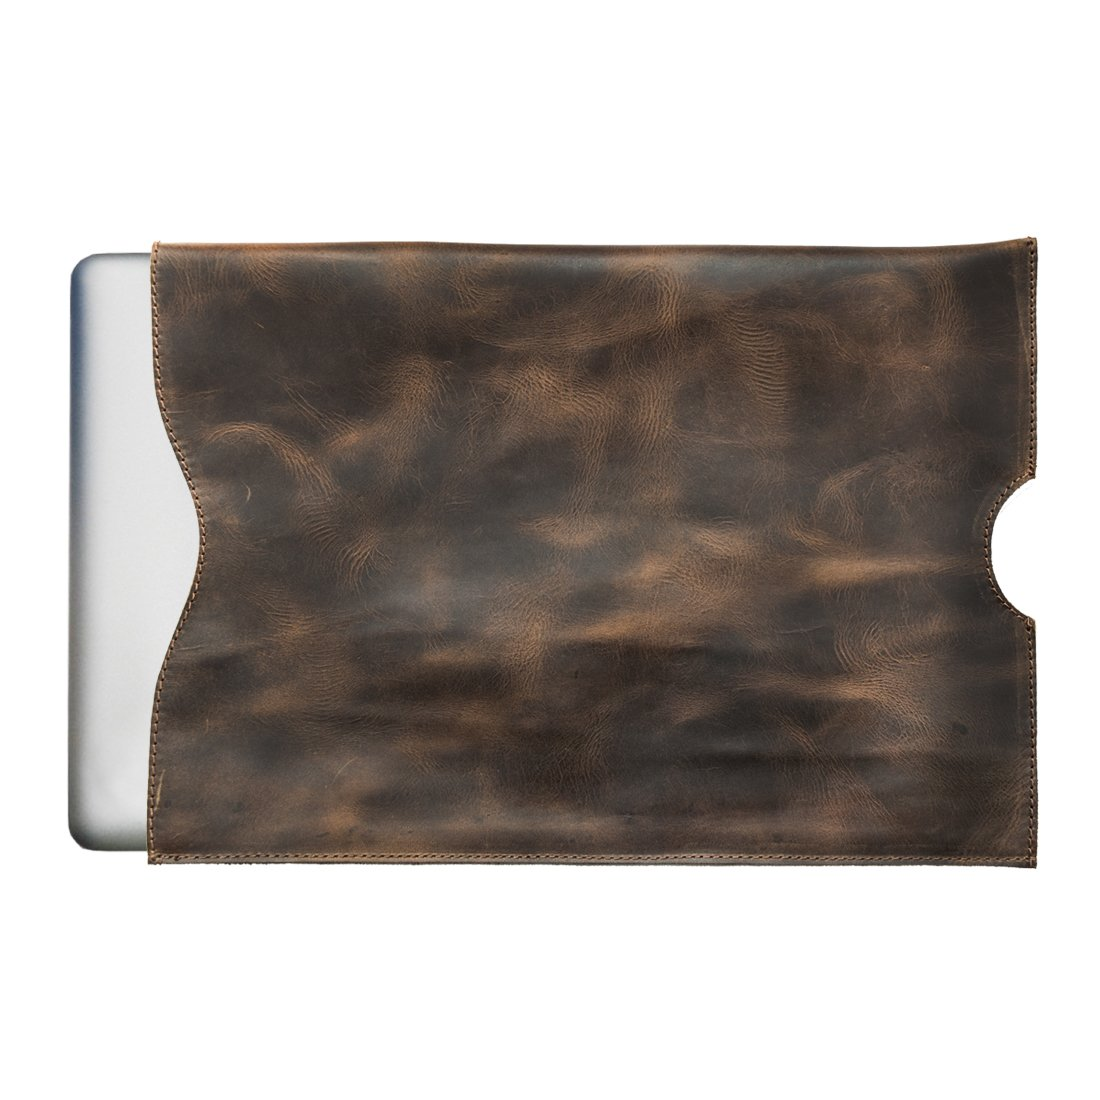 【公式】 Rustic Macbook Leather Macbook Sleeve (15